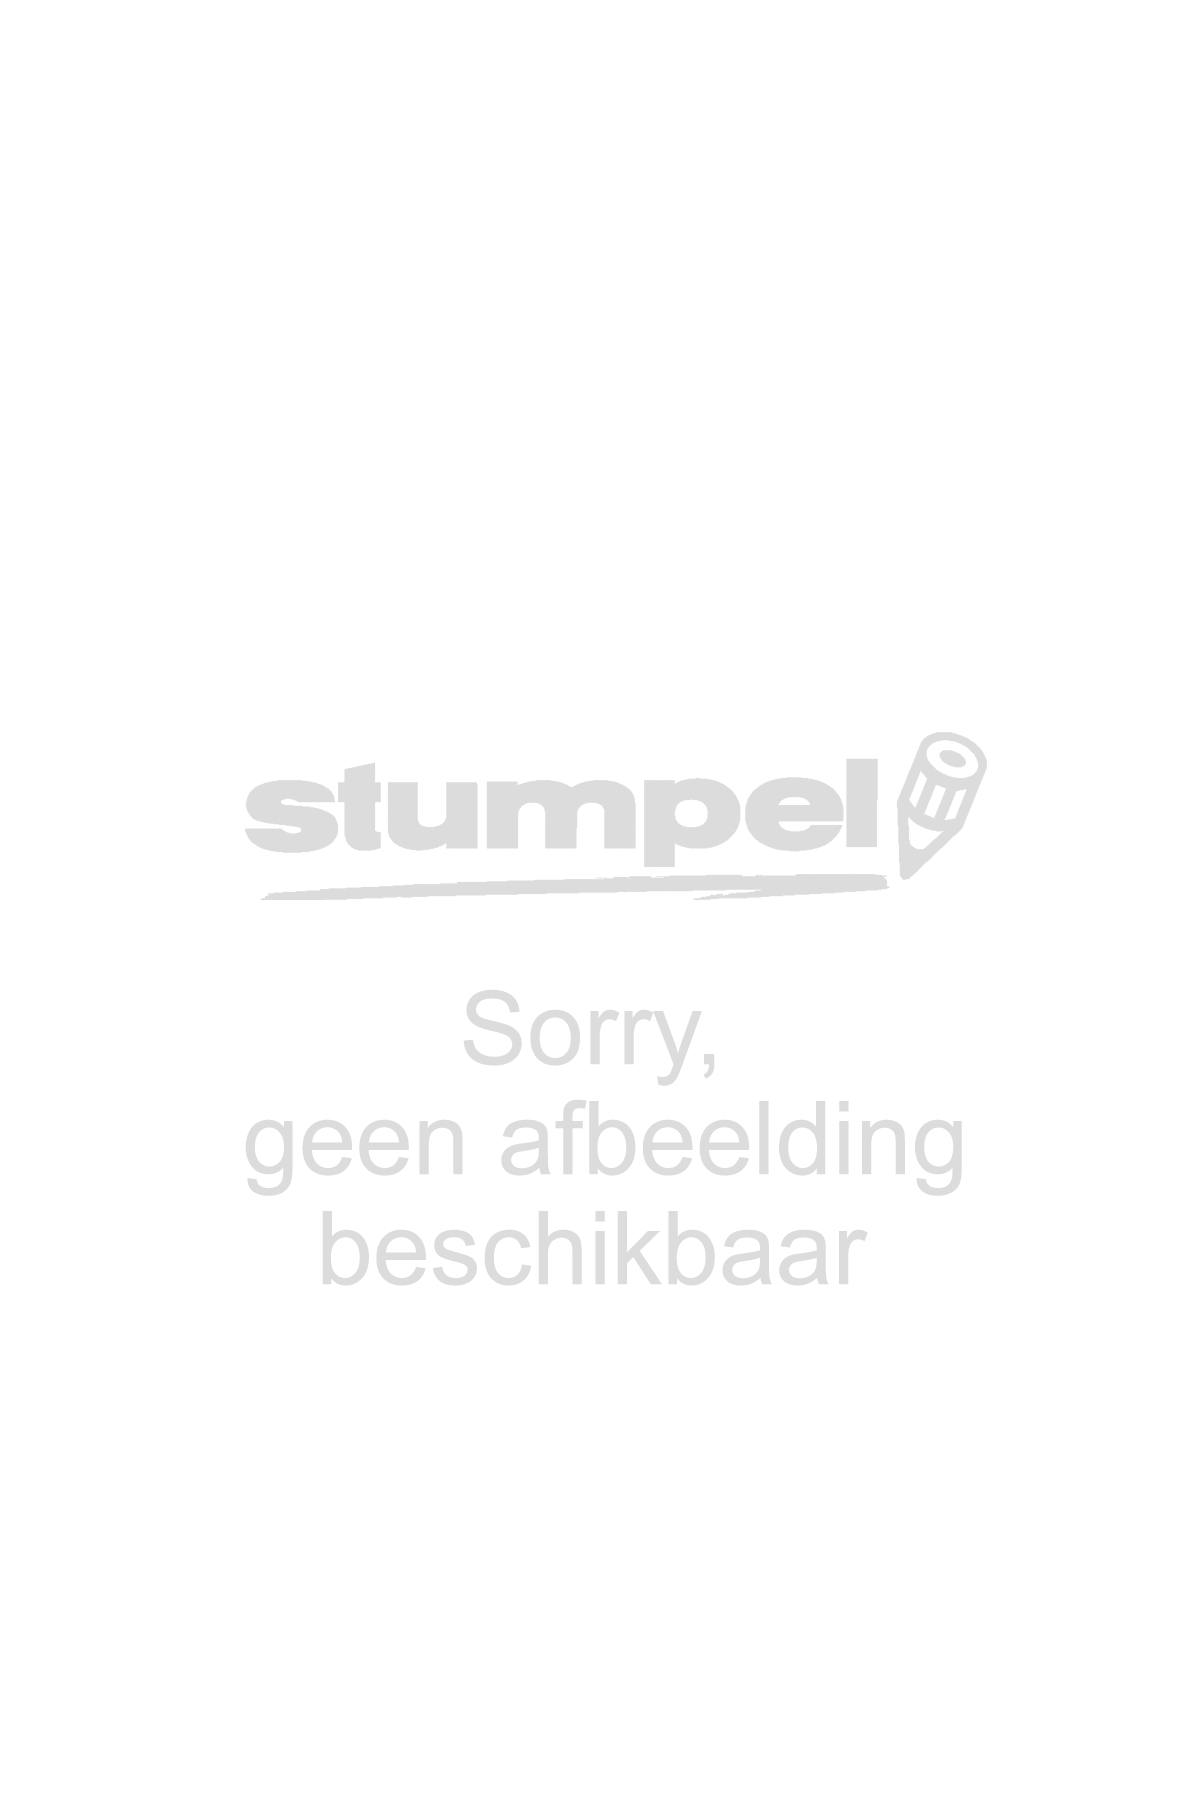 agenda-2021-ryam-efficiency-kort-7-dagen-nl-blauw-11010923